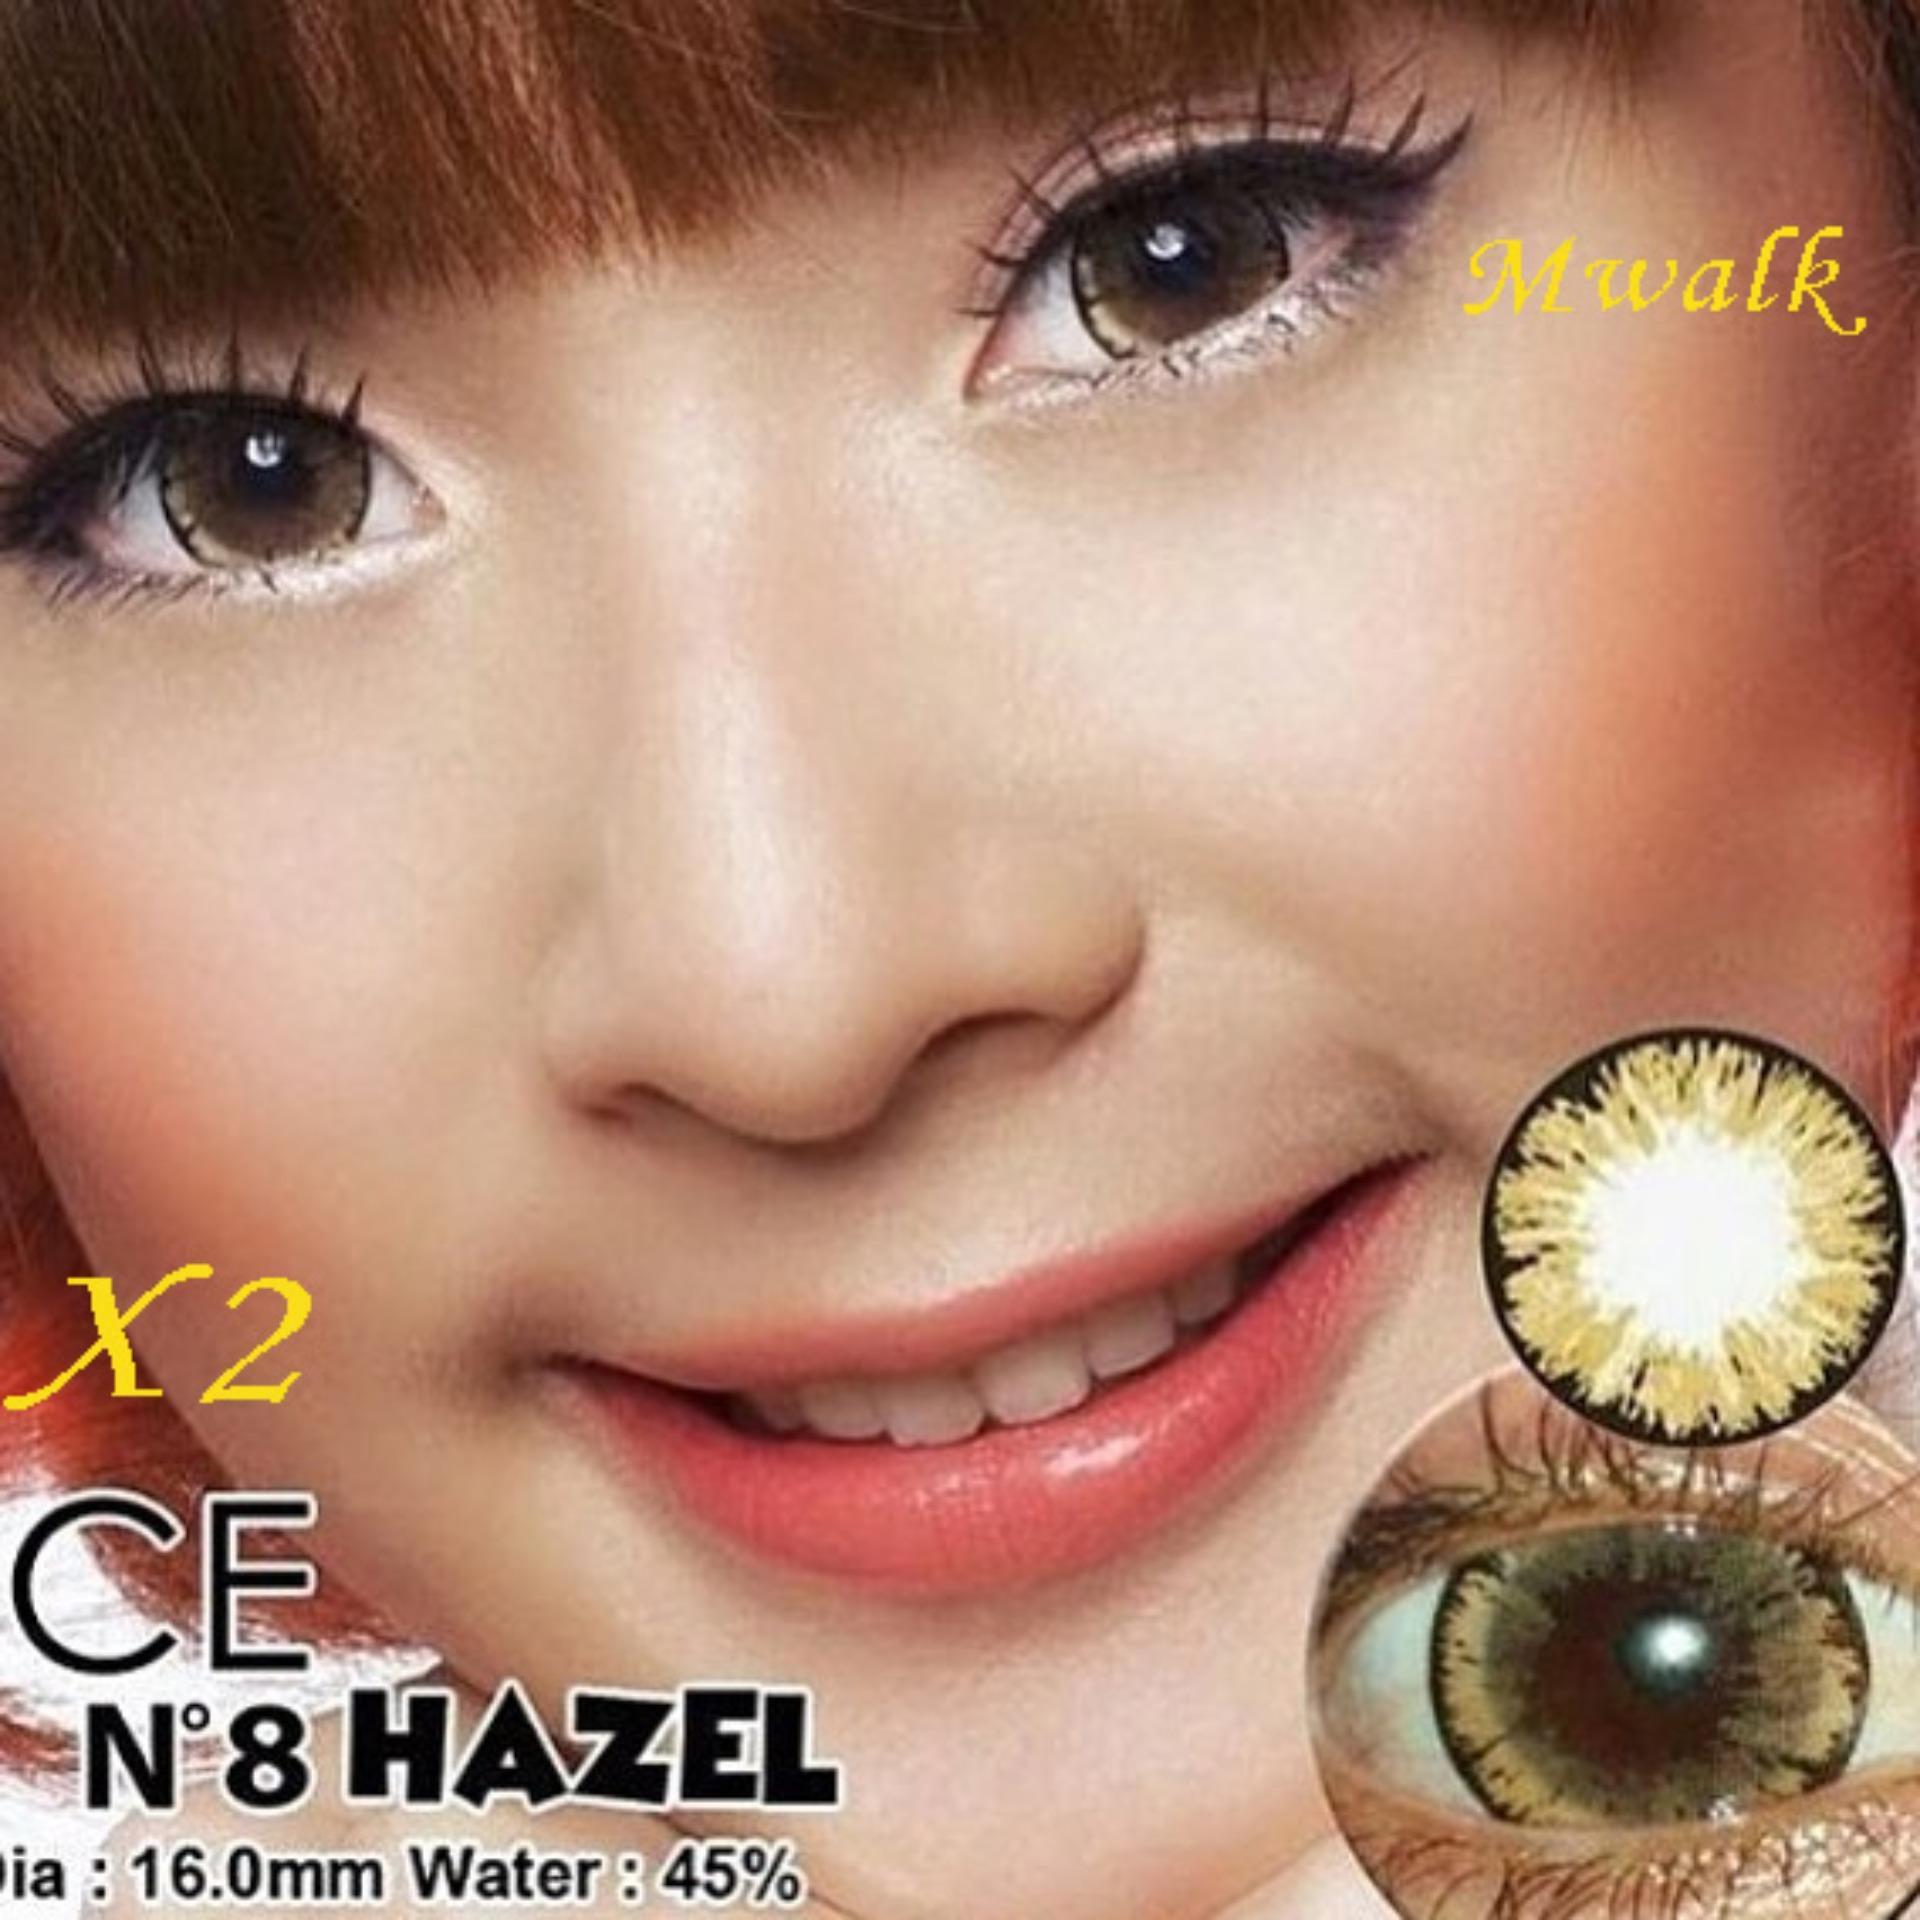 X2 Ice Nude N8 Softlens – Hazel + Free Lenscase